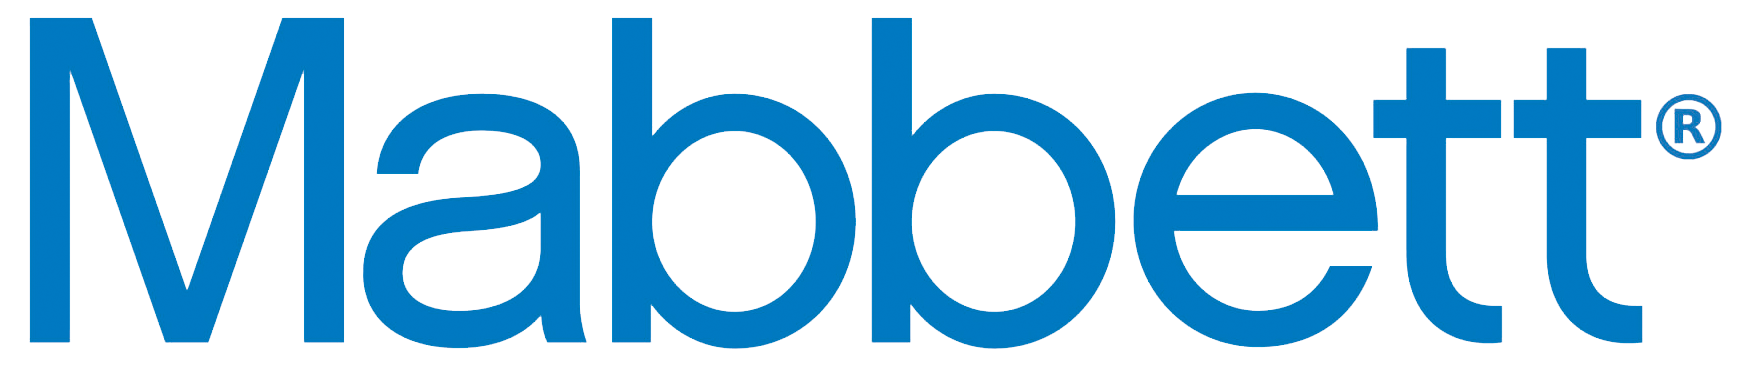 new-logo-1